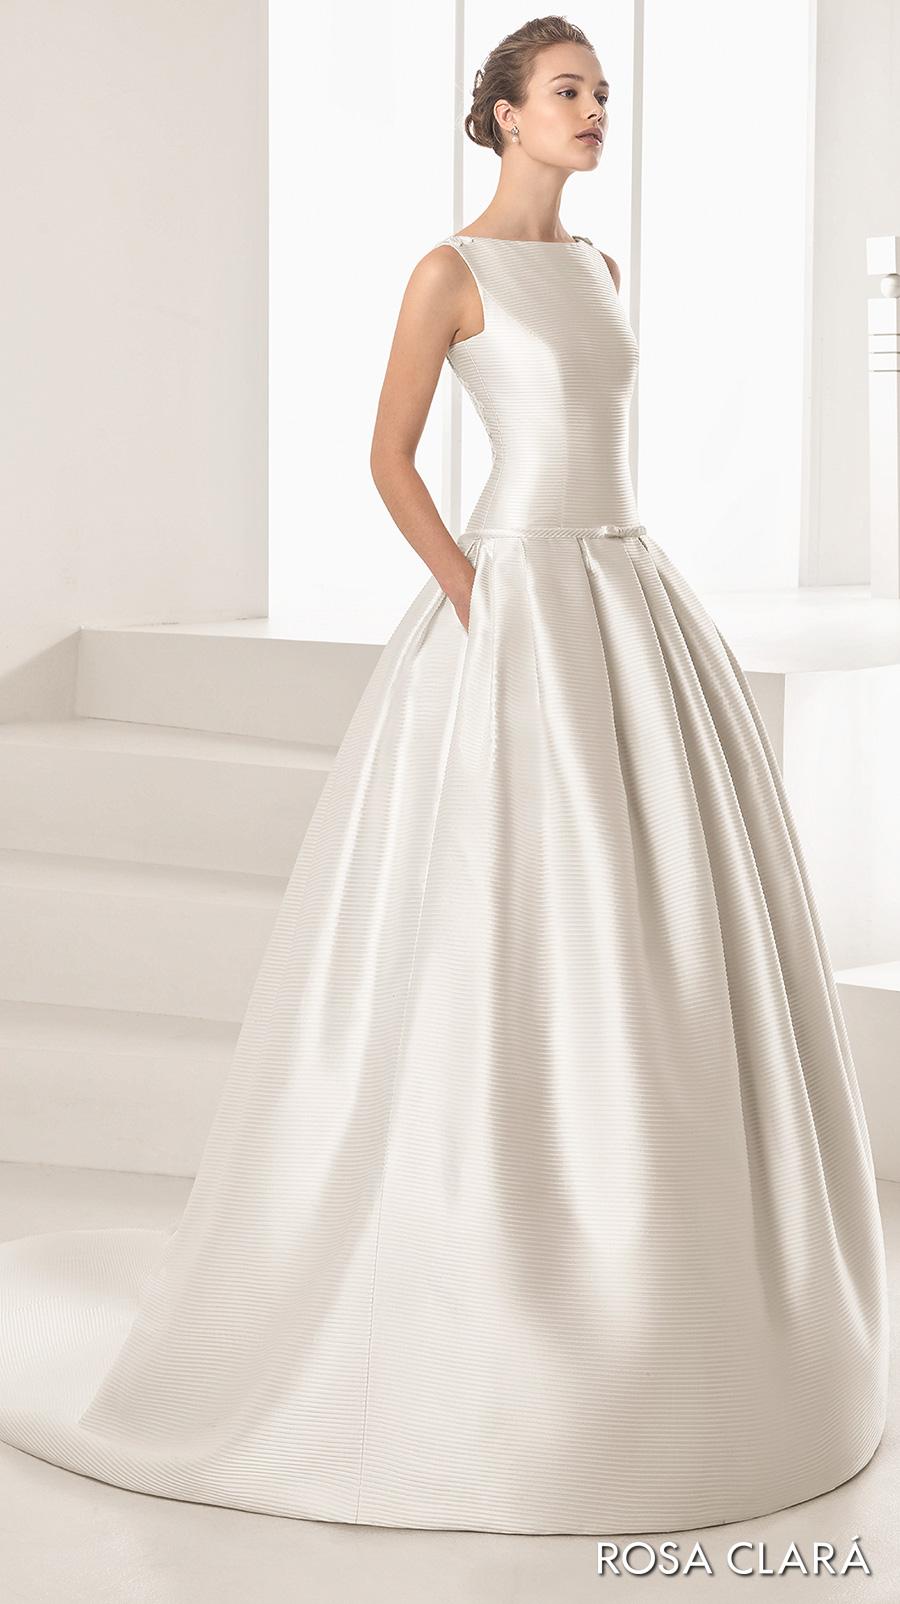 Where to clean wedding dress wedding ideas for Clean my wedding dress